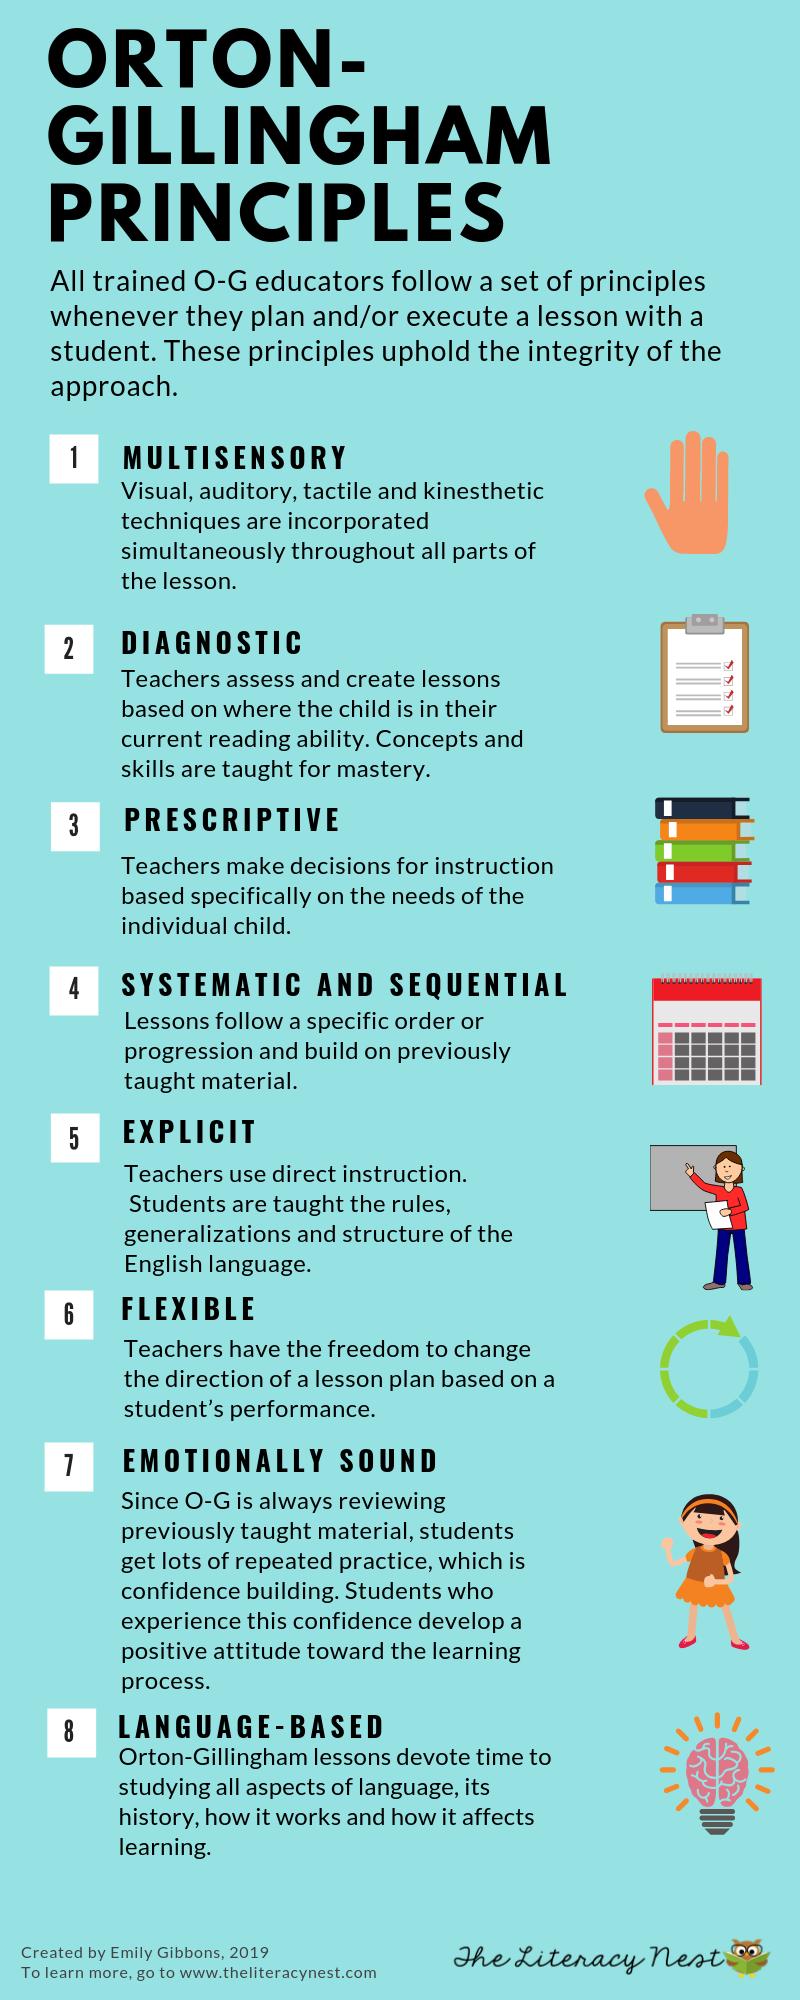 Orton-Gillingham Principles infographic